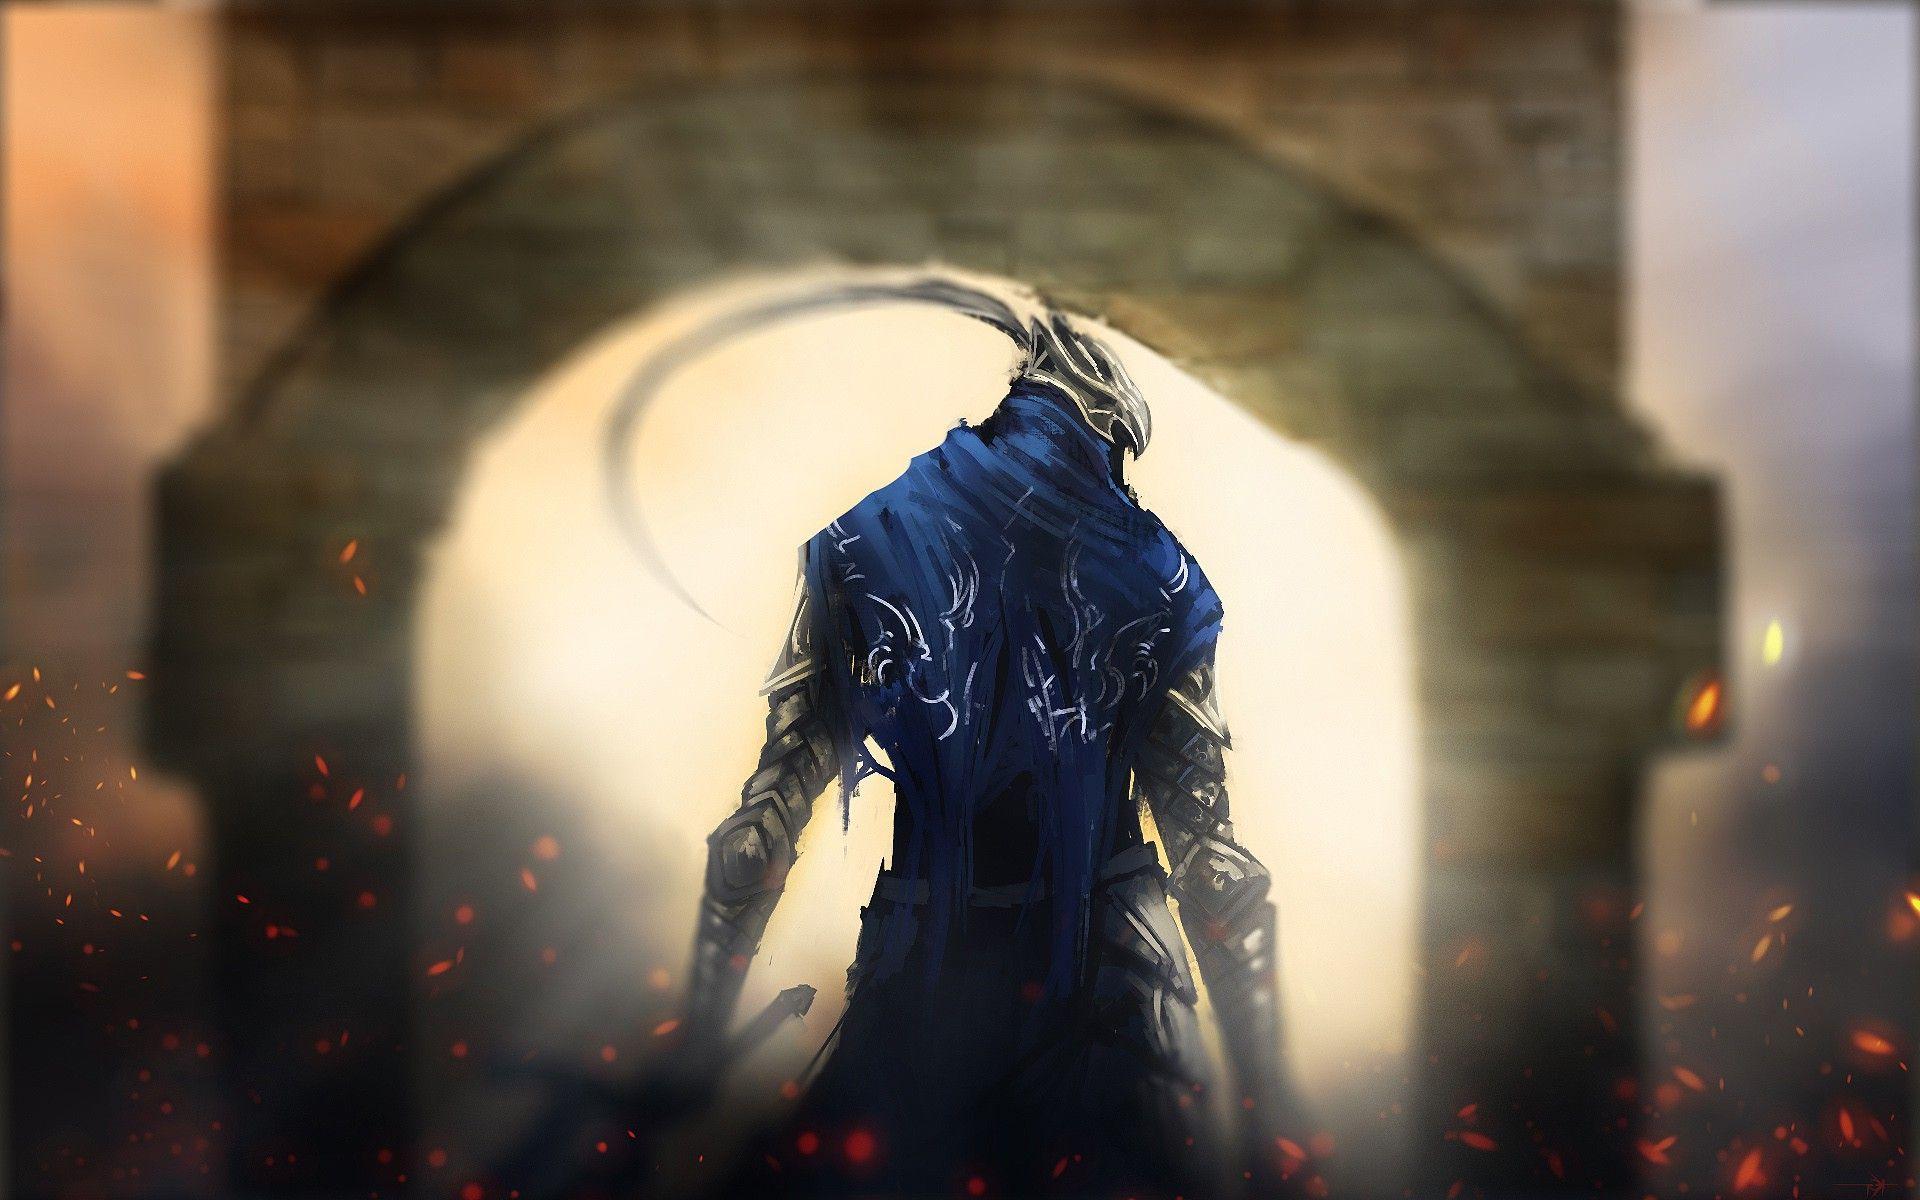 Knight artorias dark souls game hd wallpaper 1920x1200 4891